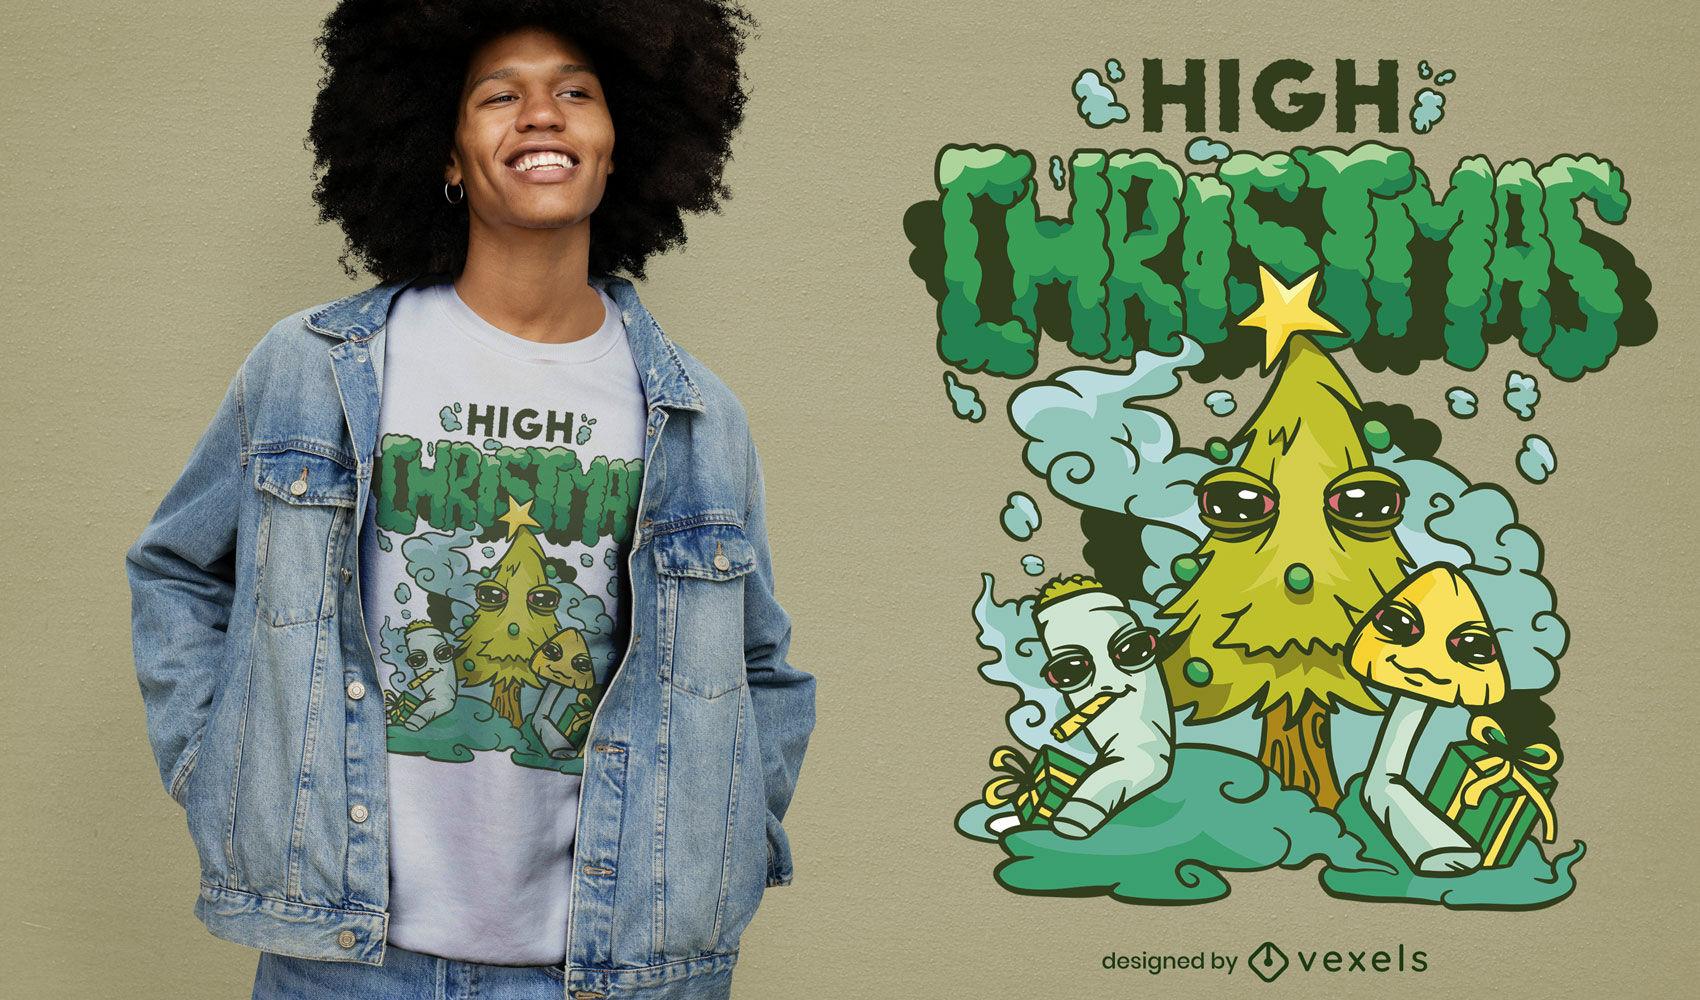 Cool high christmas t-shirt design